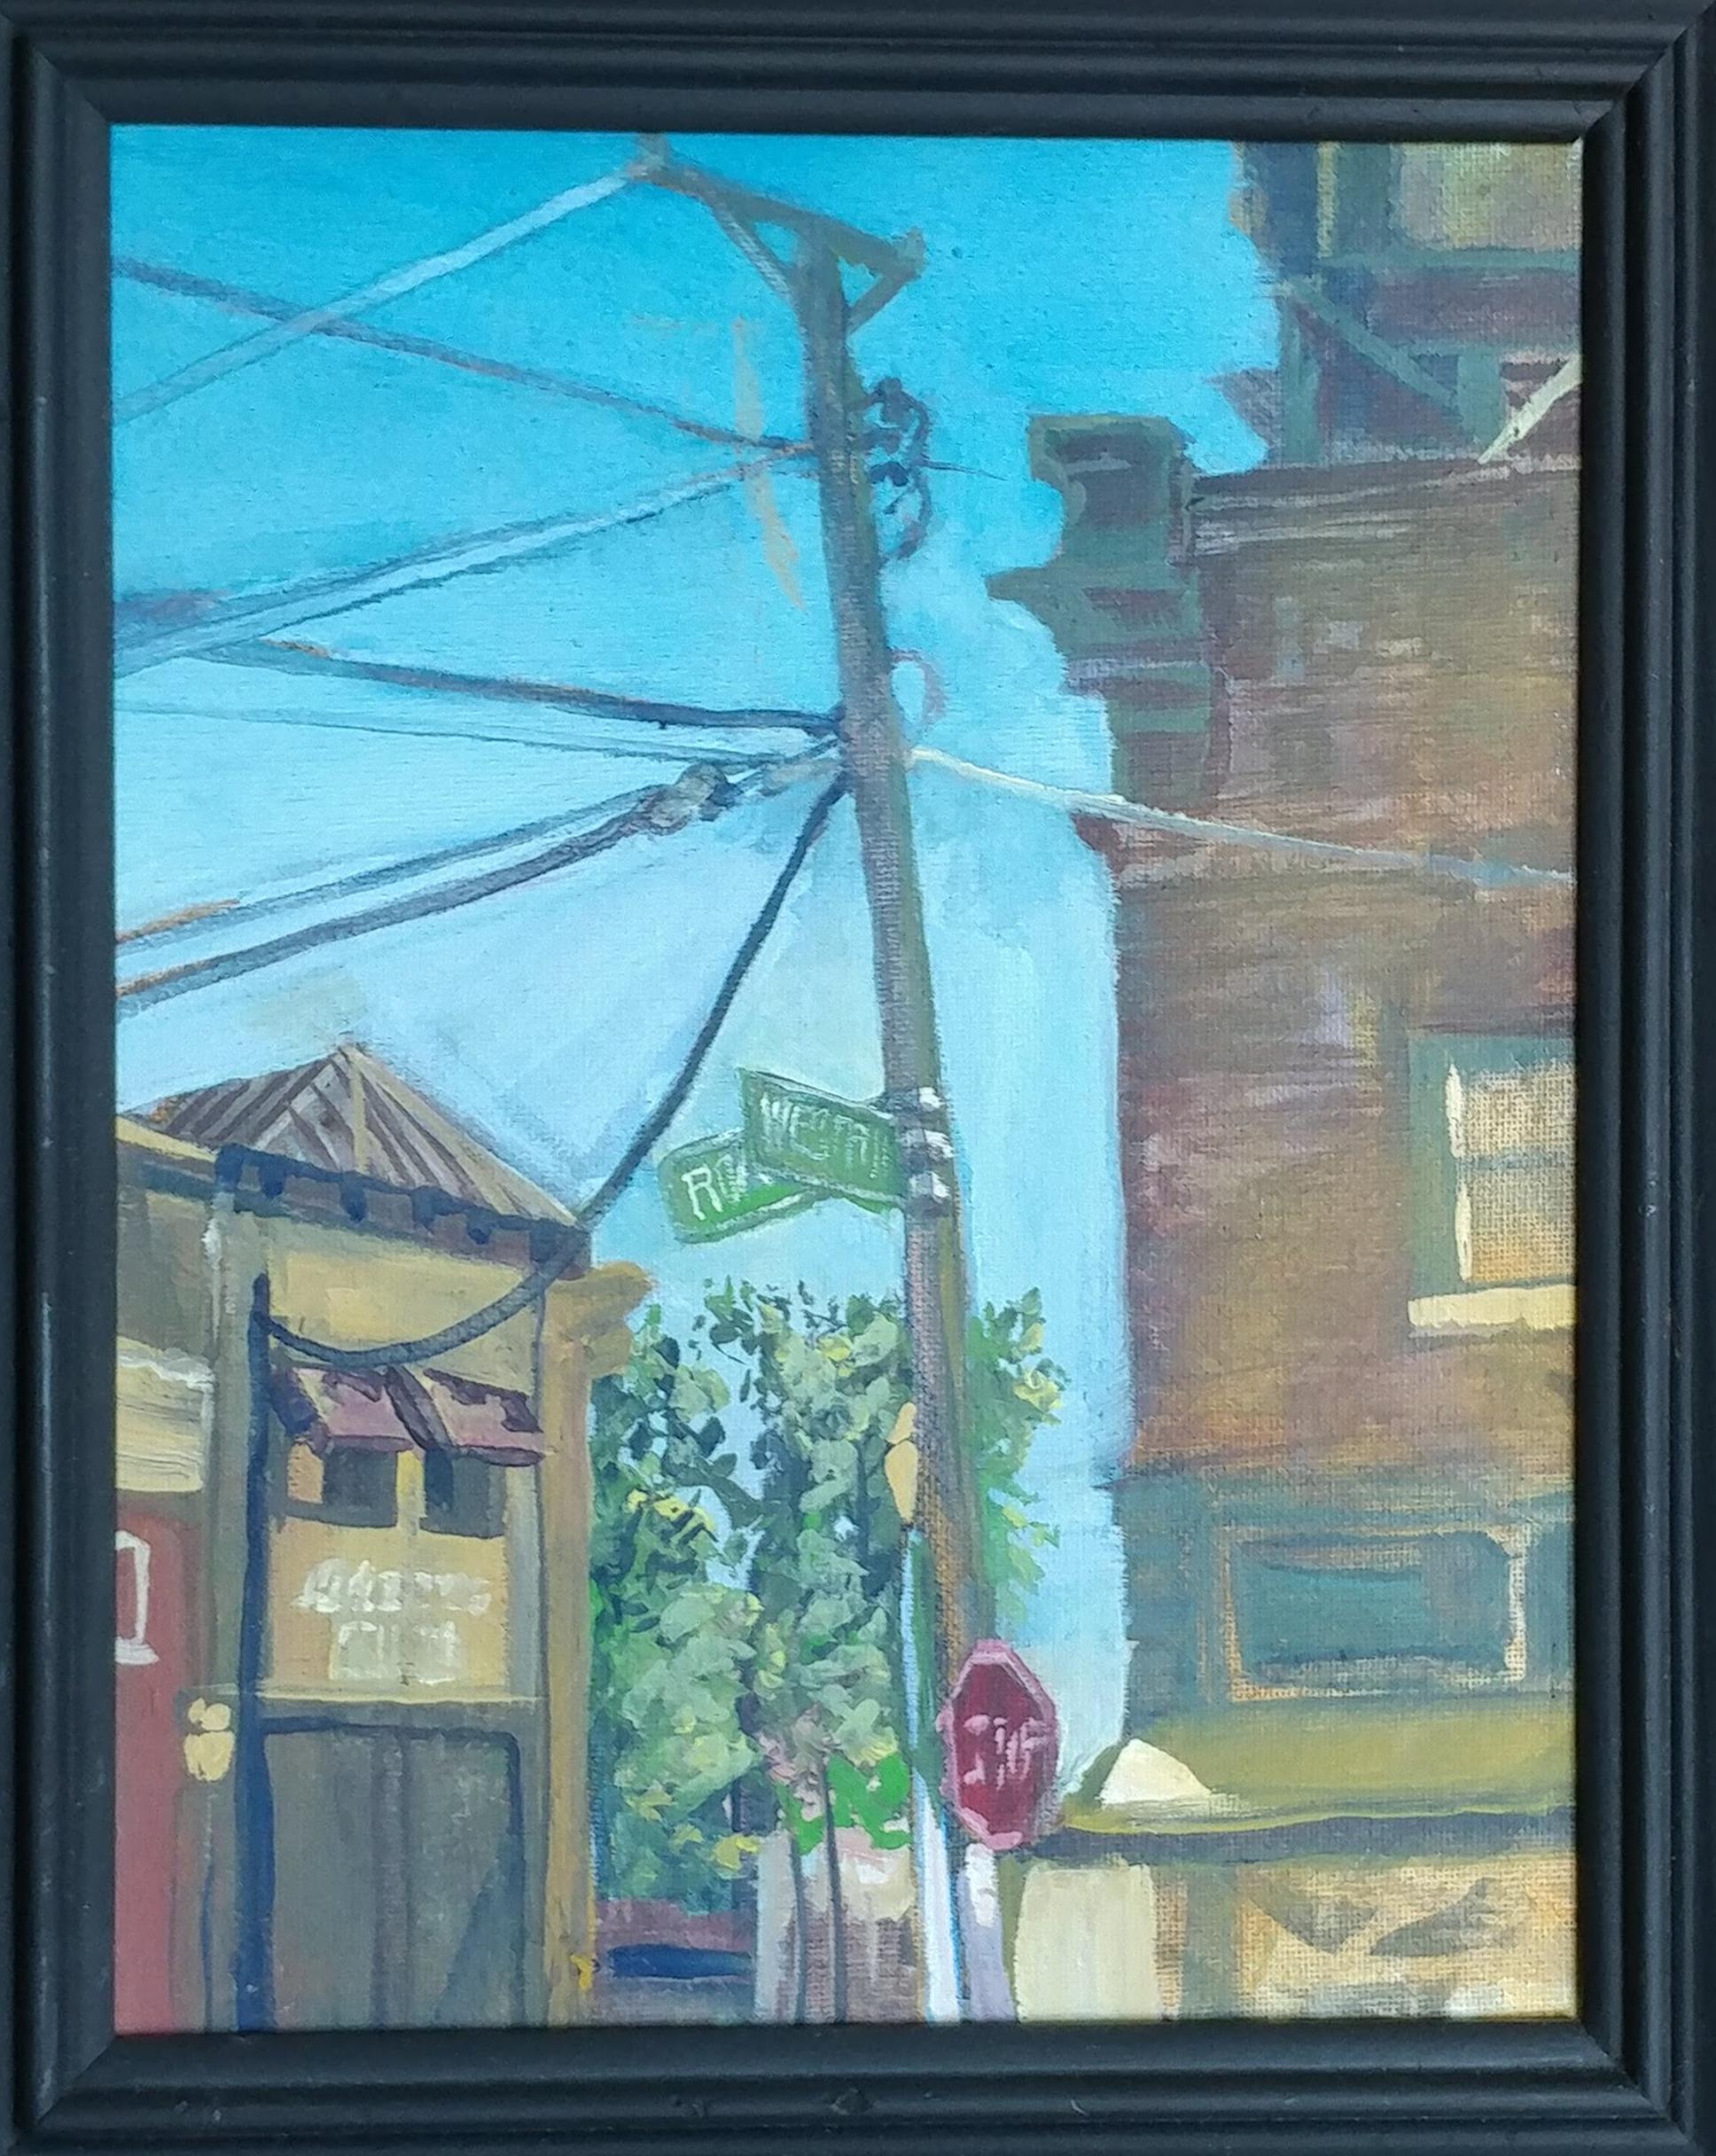 Westport plien air- Westport Road and Roenoke. Casein on 8X10 canvass.